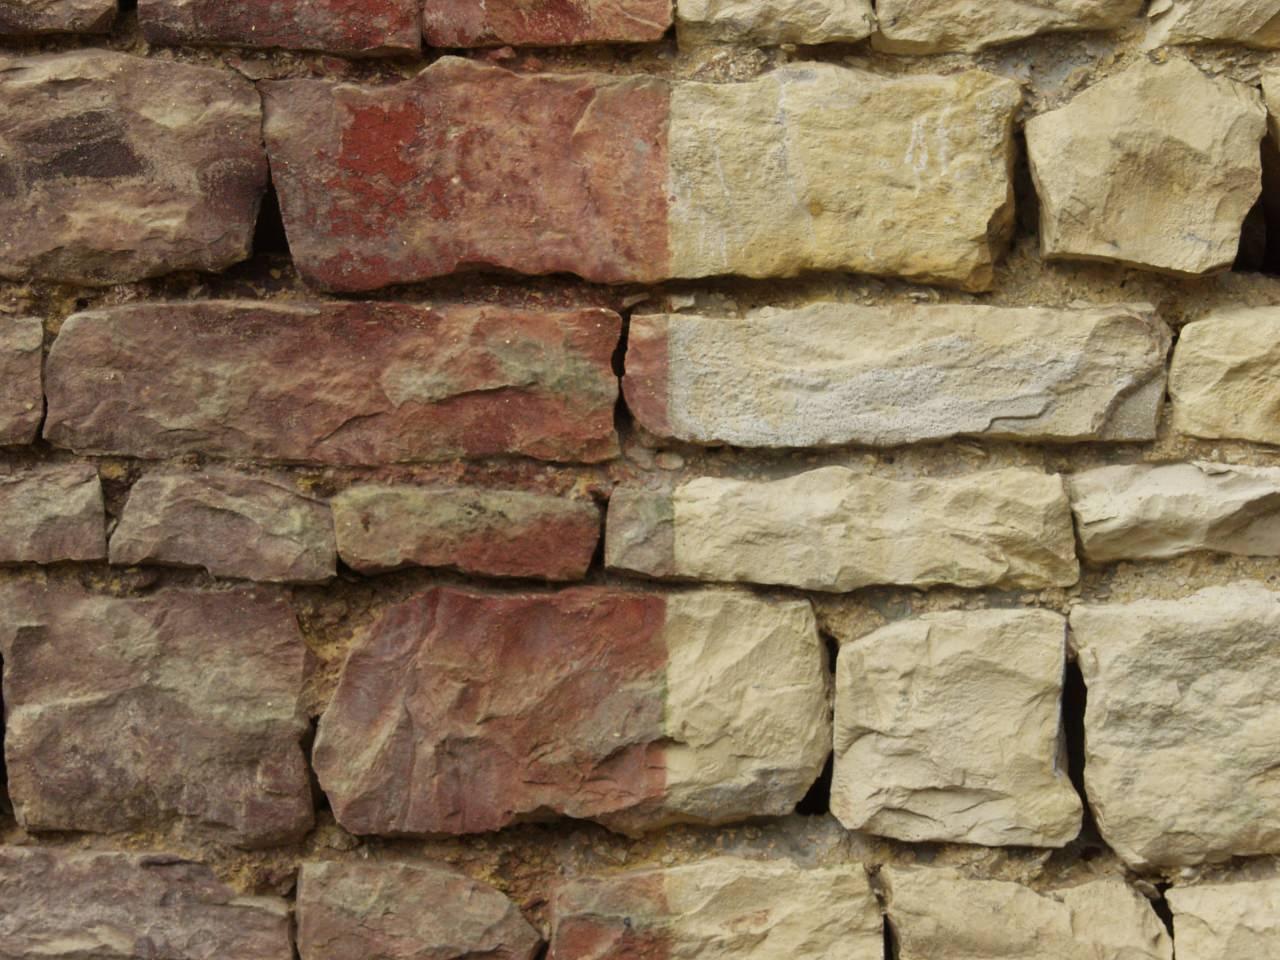 Comment Nettoyer Terrasse Pierre Naturelle nettoyage pierre de taille, décapage sablage ou hydrogommage